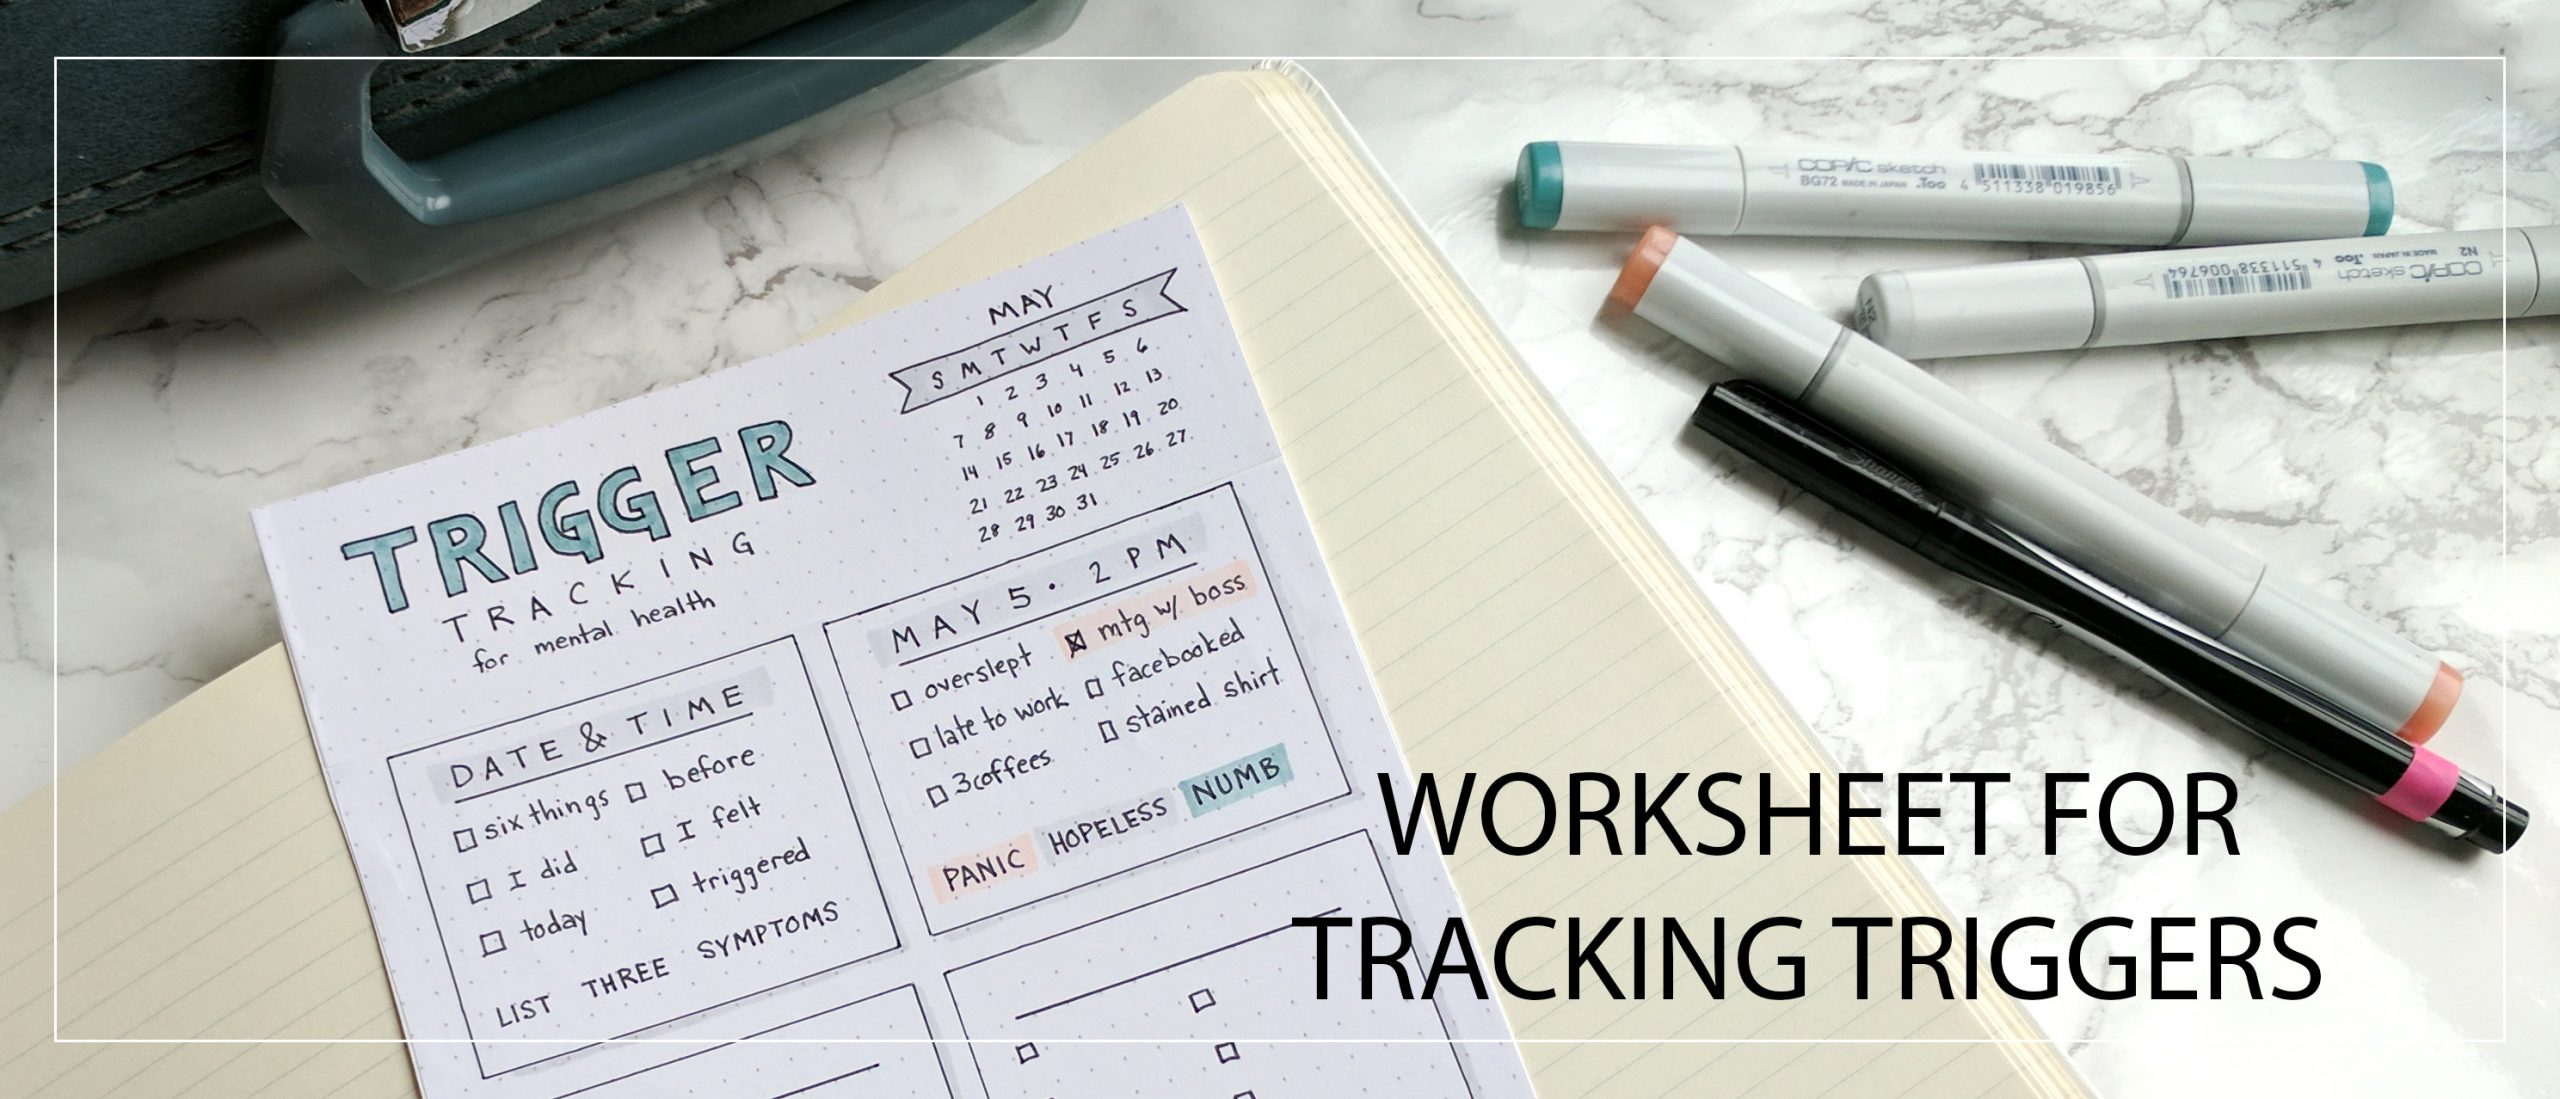 Trigger Tracker Worksheet For Mental Health Journaling And